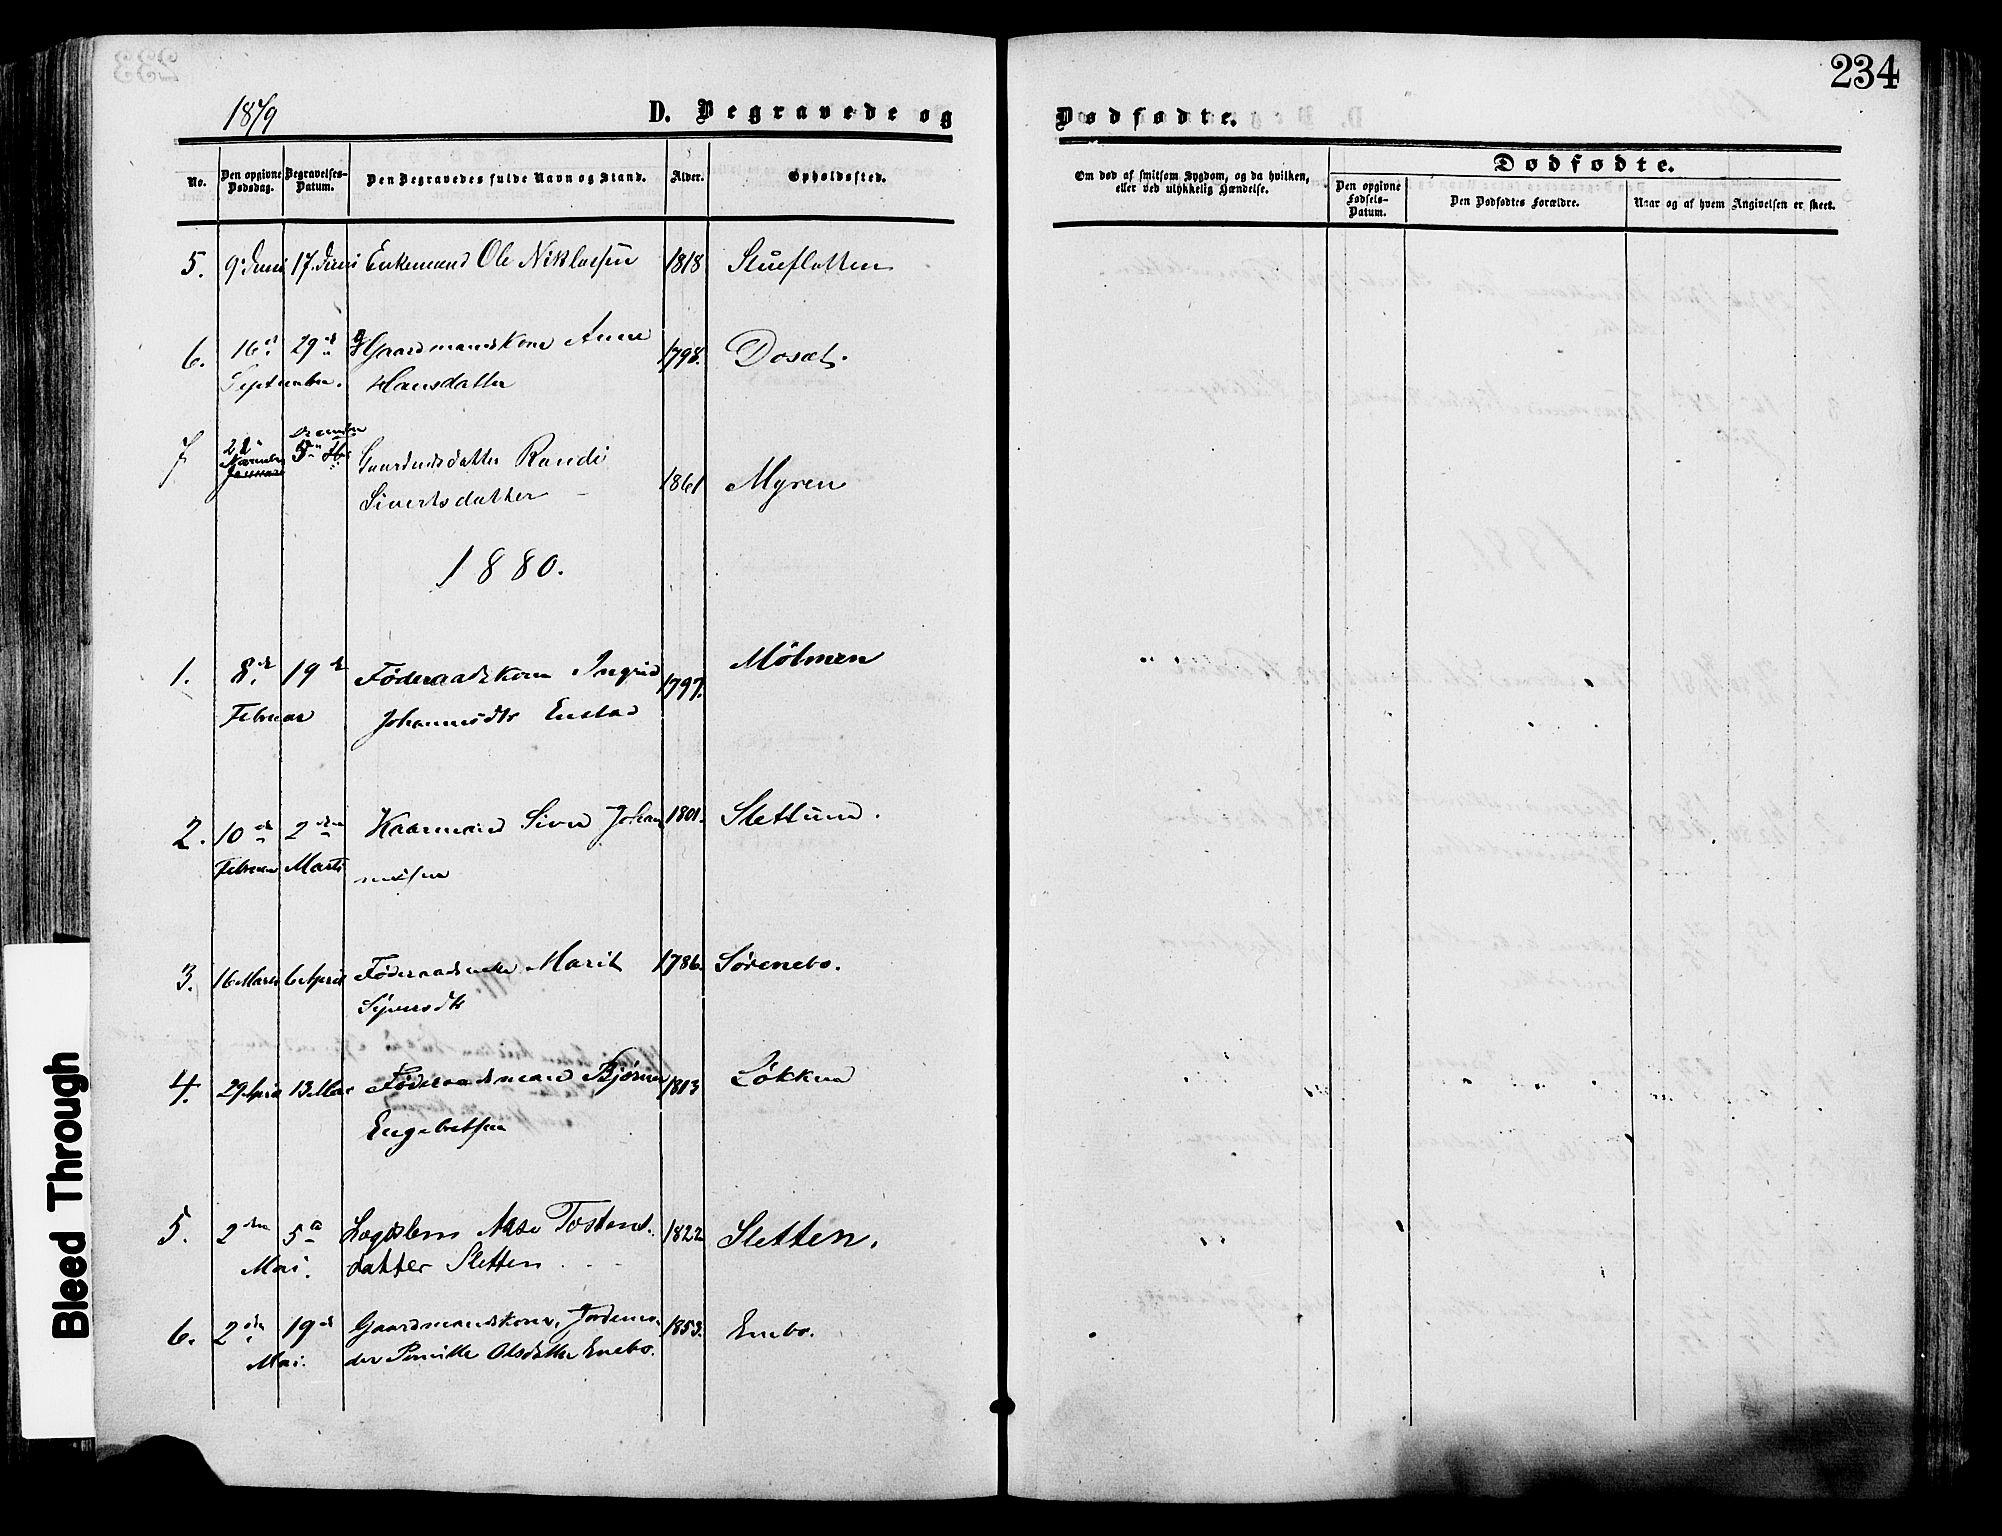 SAH, Lesja prestekontor, Ministerialbok nr. 9, 1854-1889, s. 234